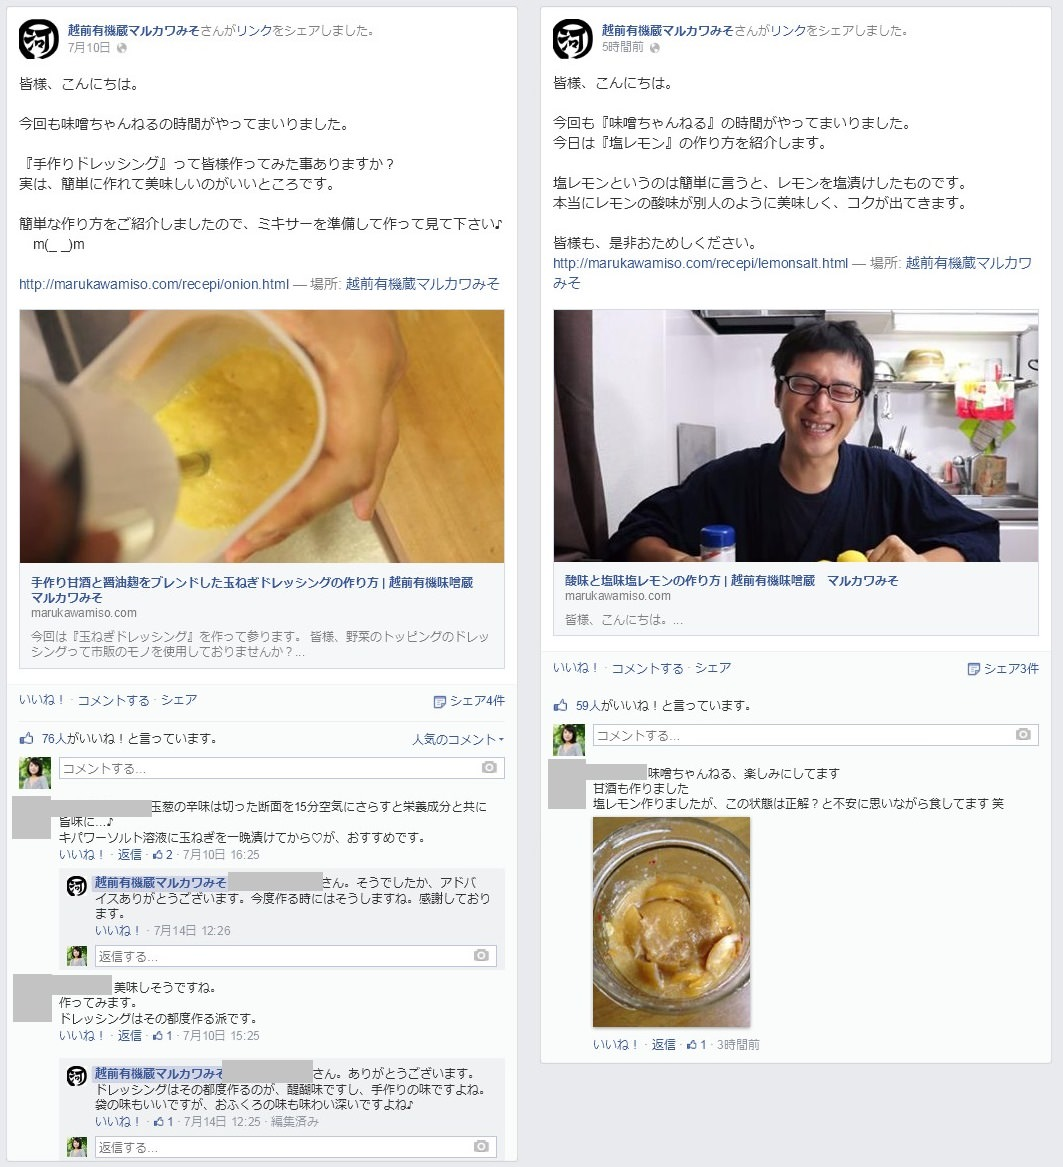 Facebook 活用 事例 プロモーション 越前有機蔵マルカワみそ